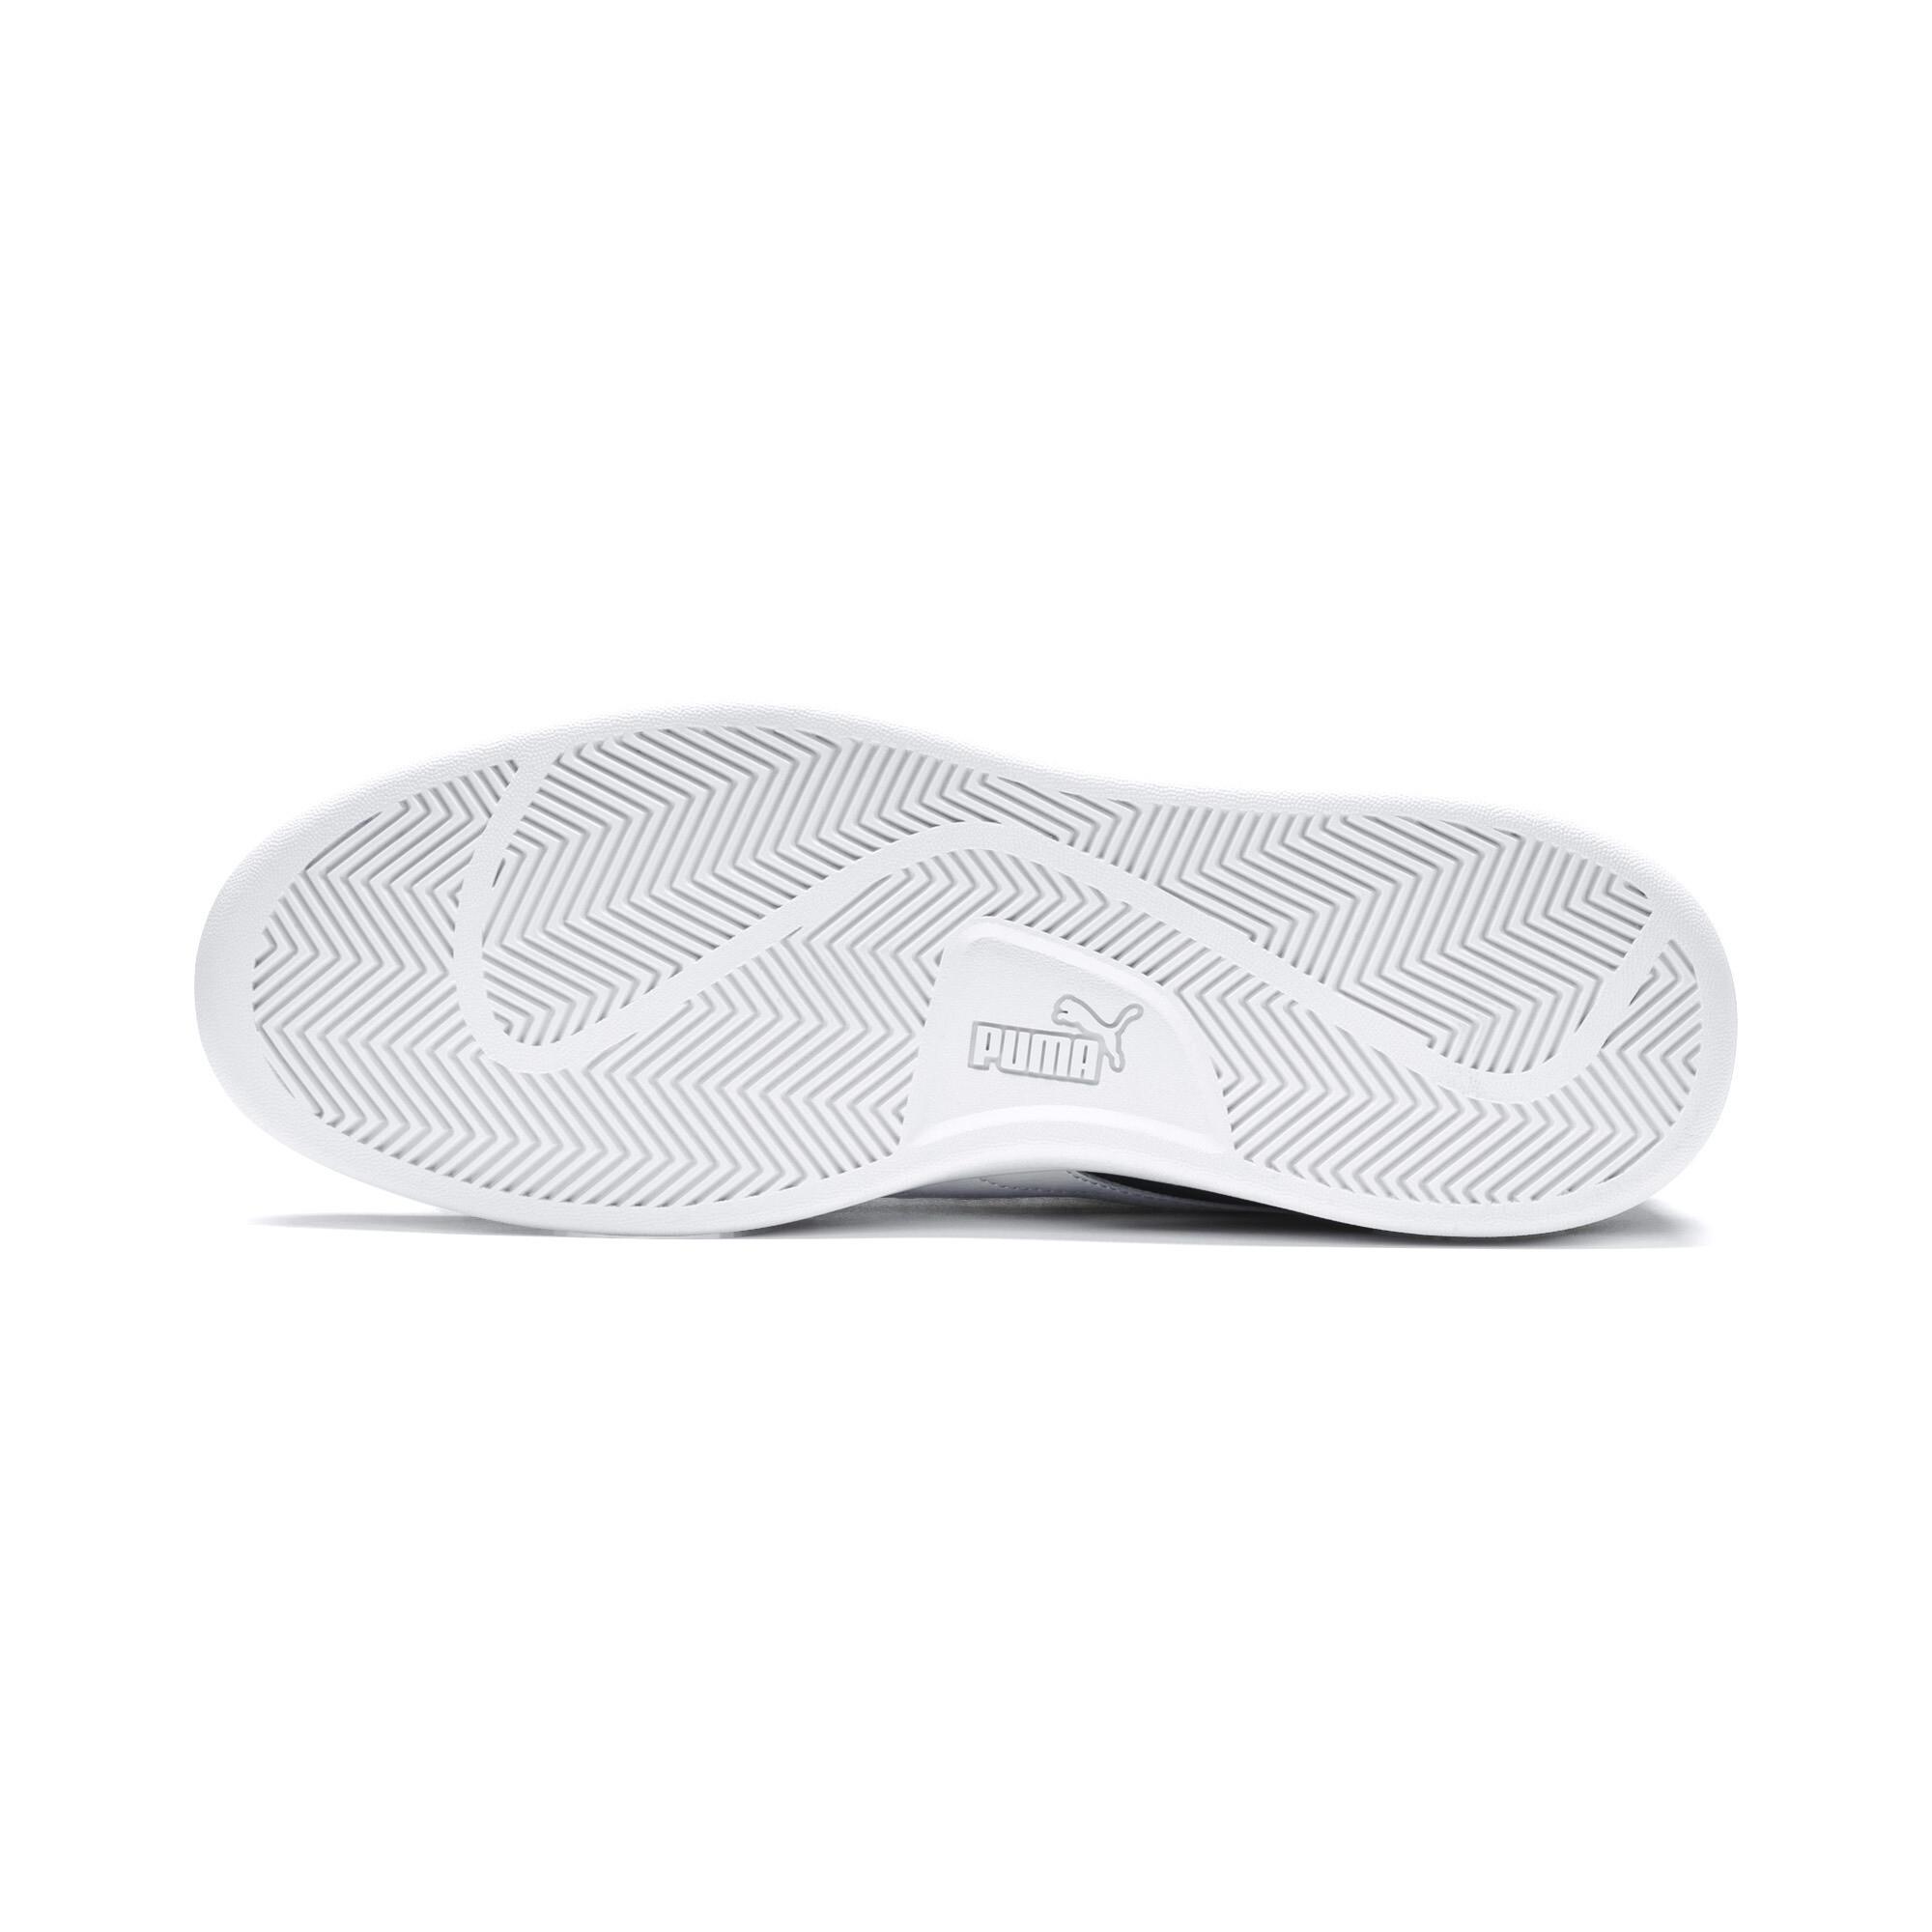 PUMA-Men-039-s-Astro-Kick-Sneakers thumbnail 28